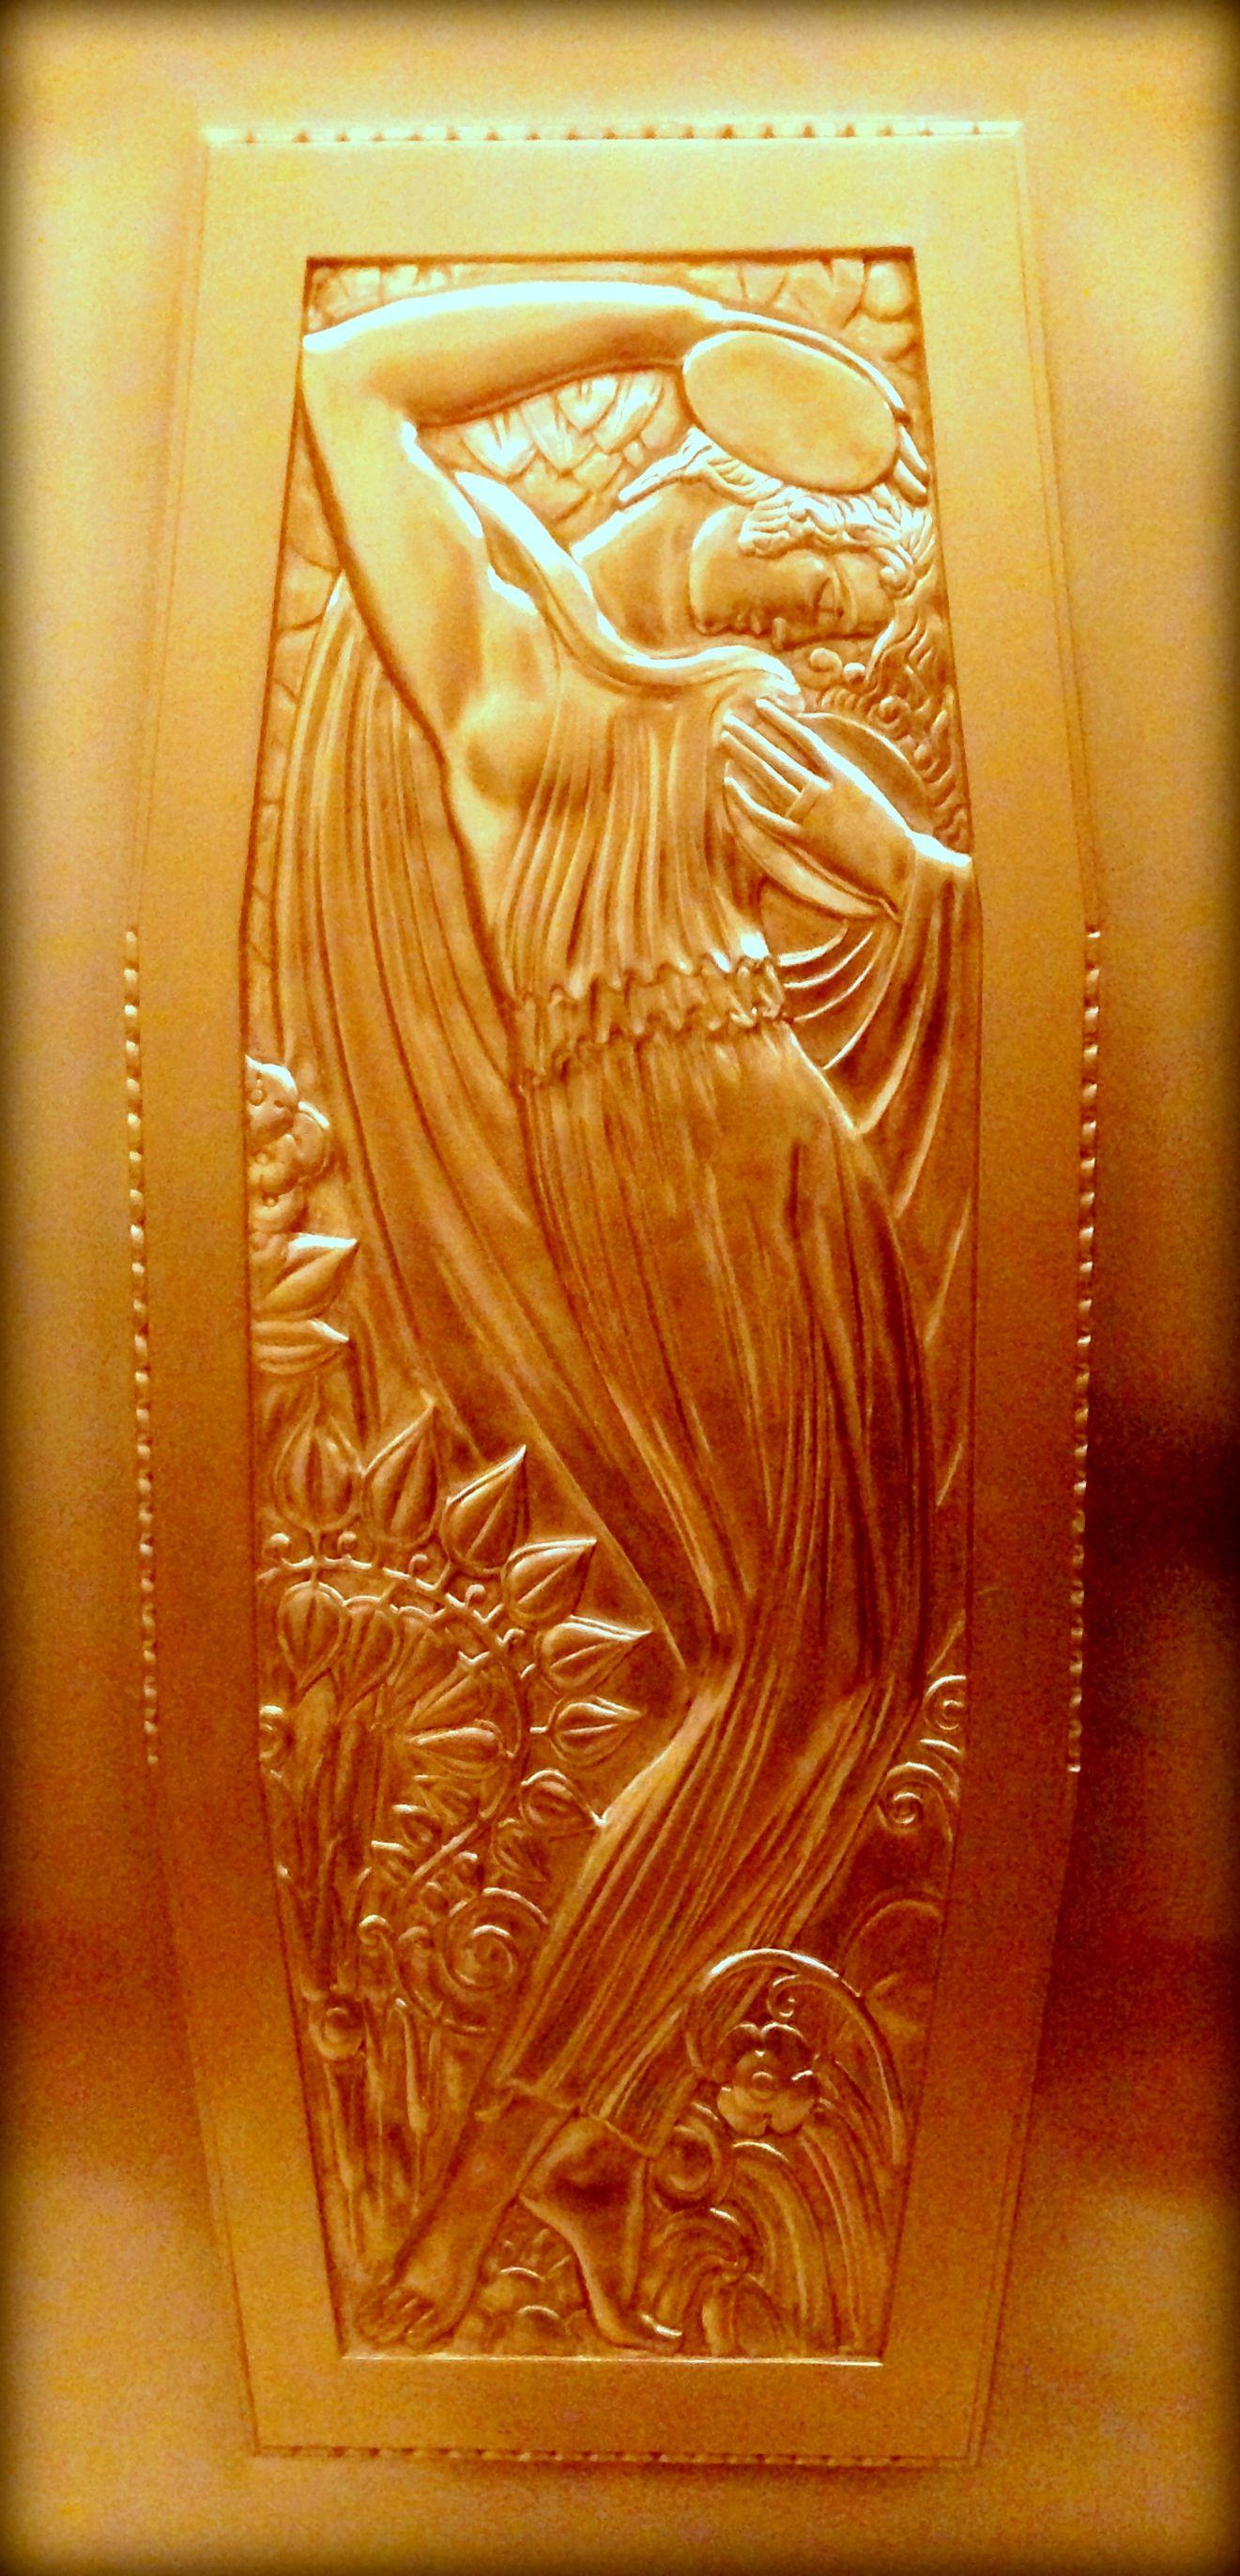 Art deco elevator waldorf astoria hotel nyc places ive seen